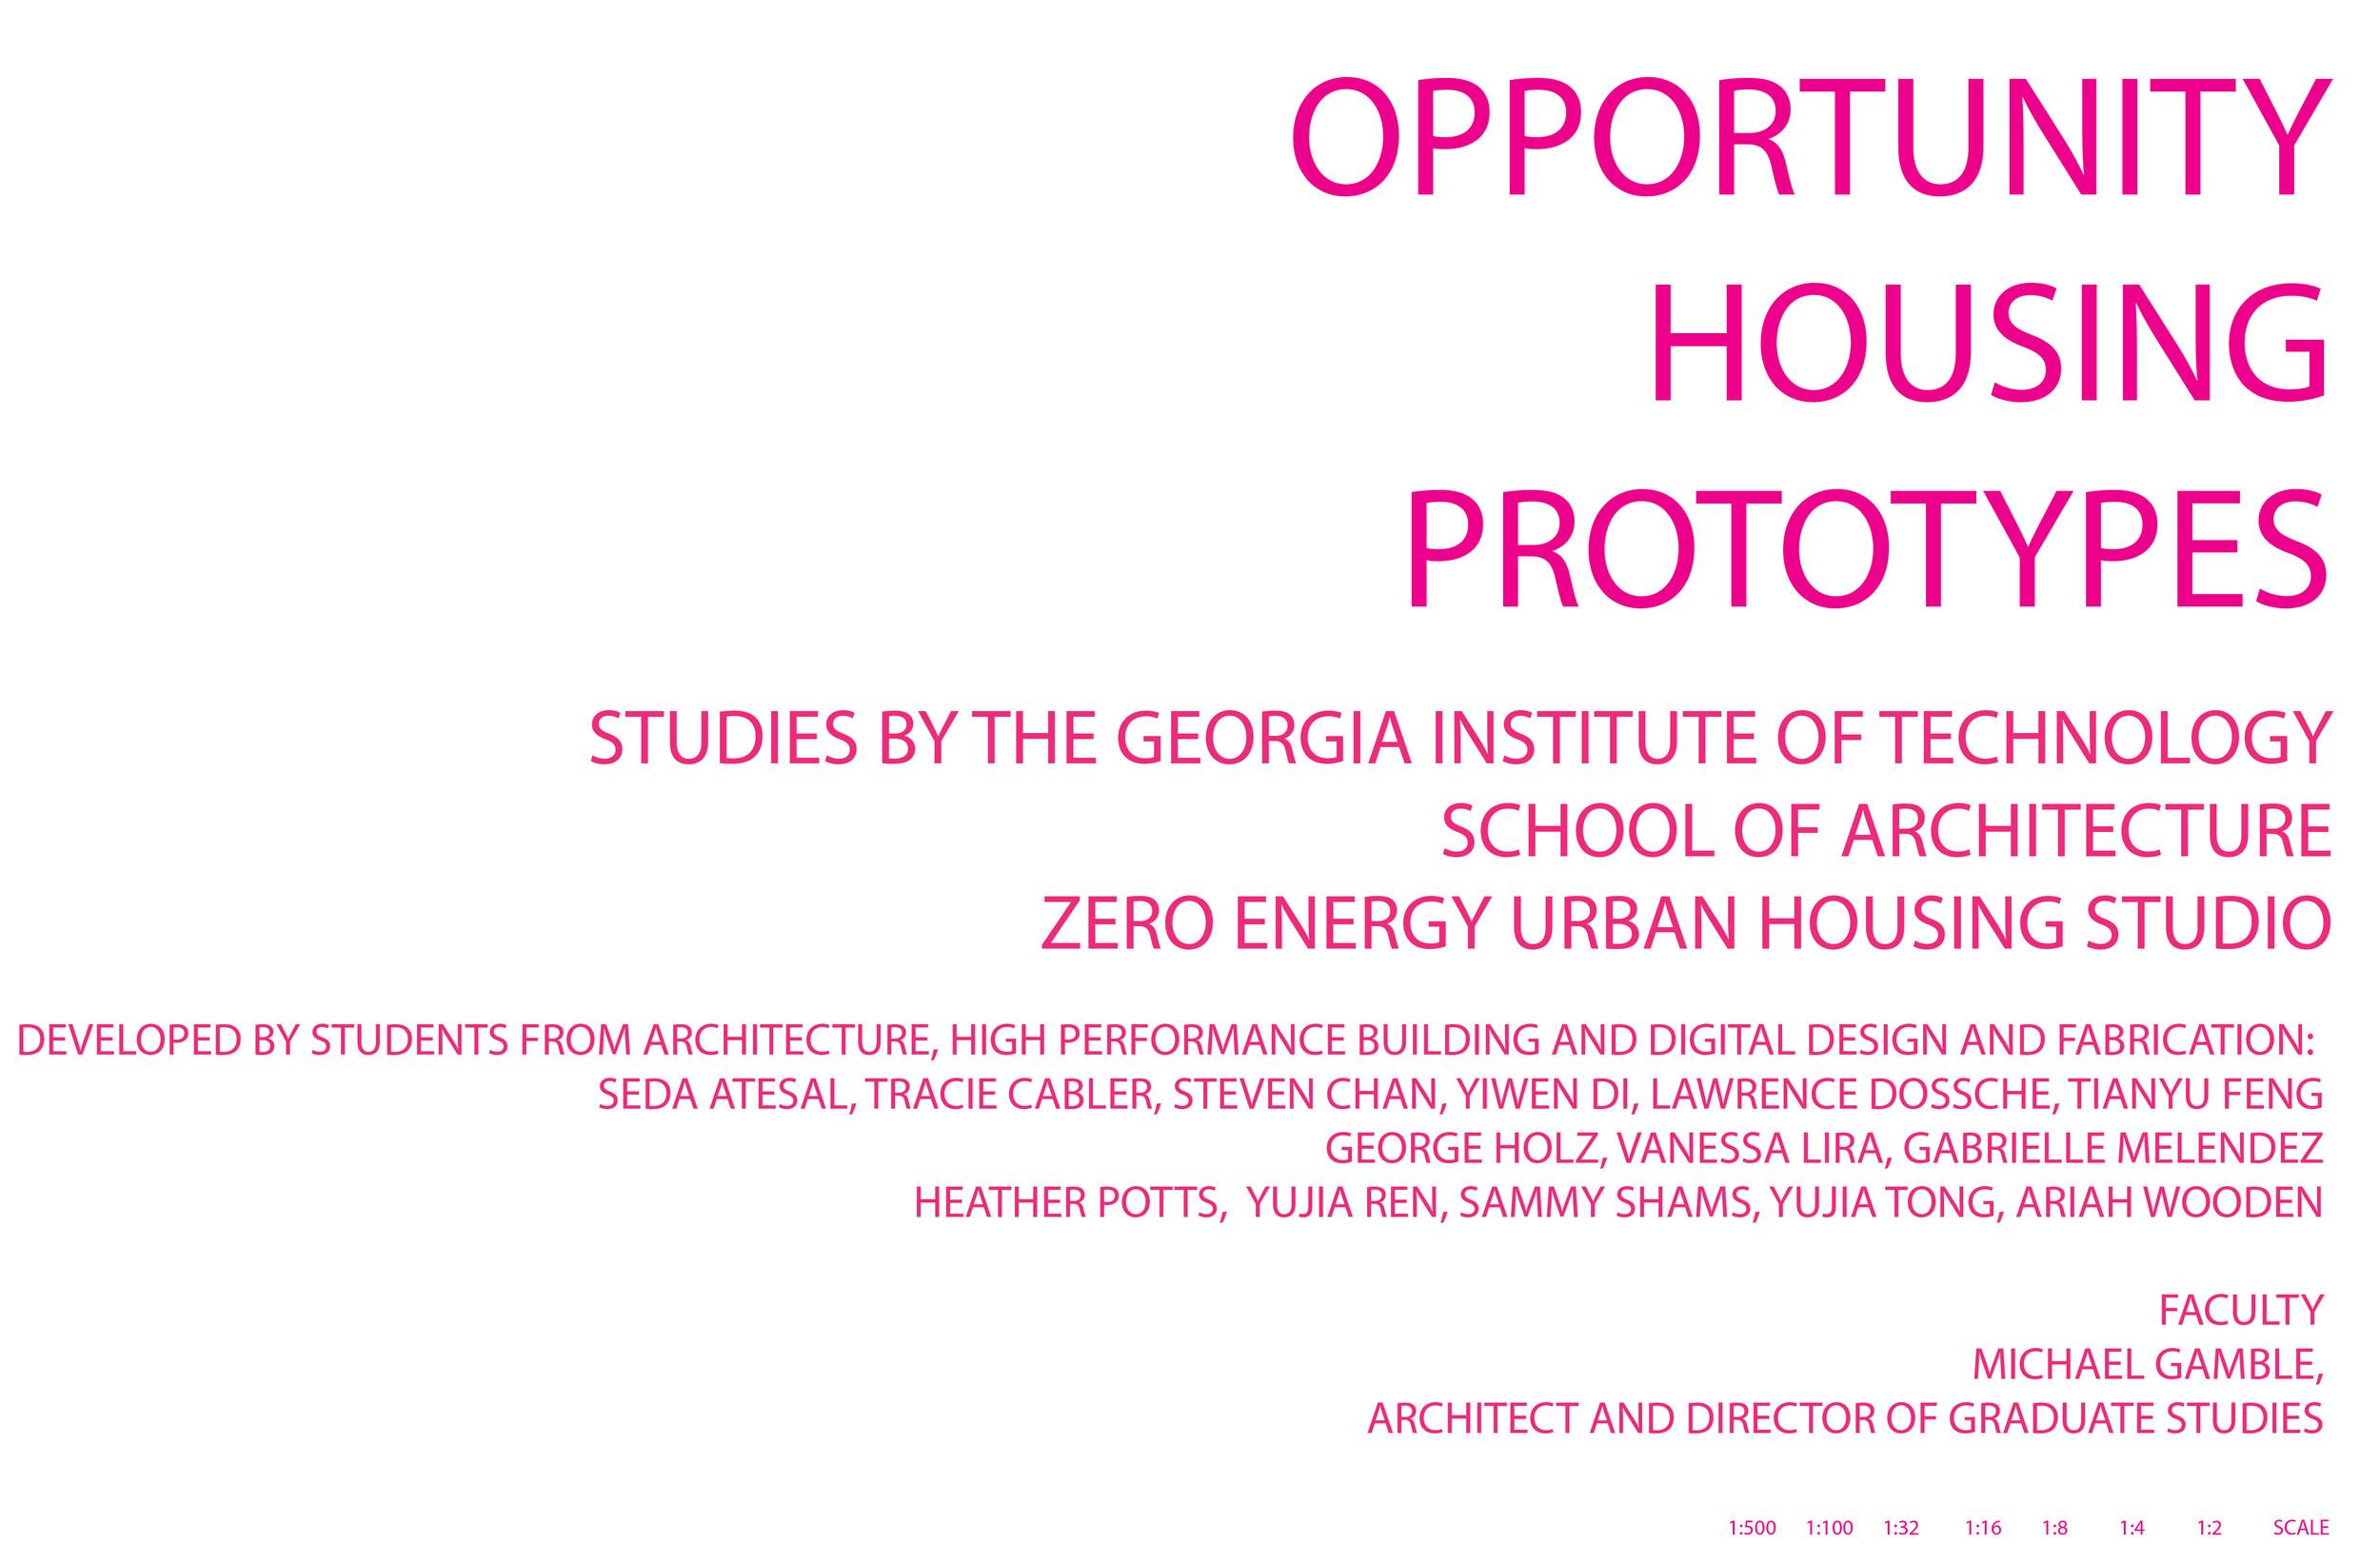 Opportunity Housing Prototypes.jpg